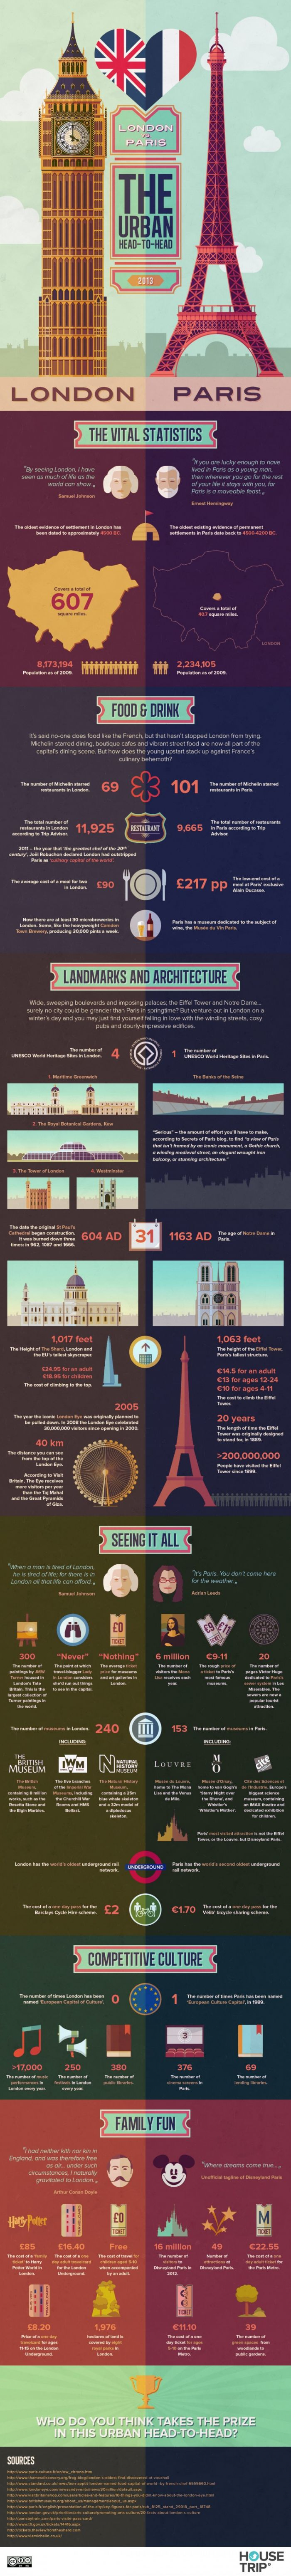 London Vs Paris: Which One Wins?